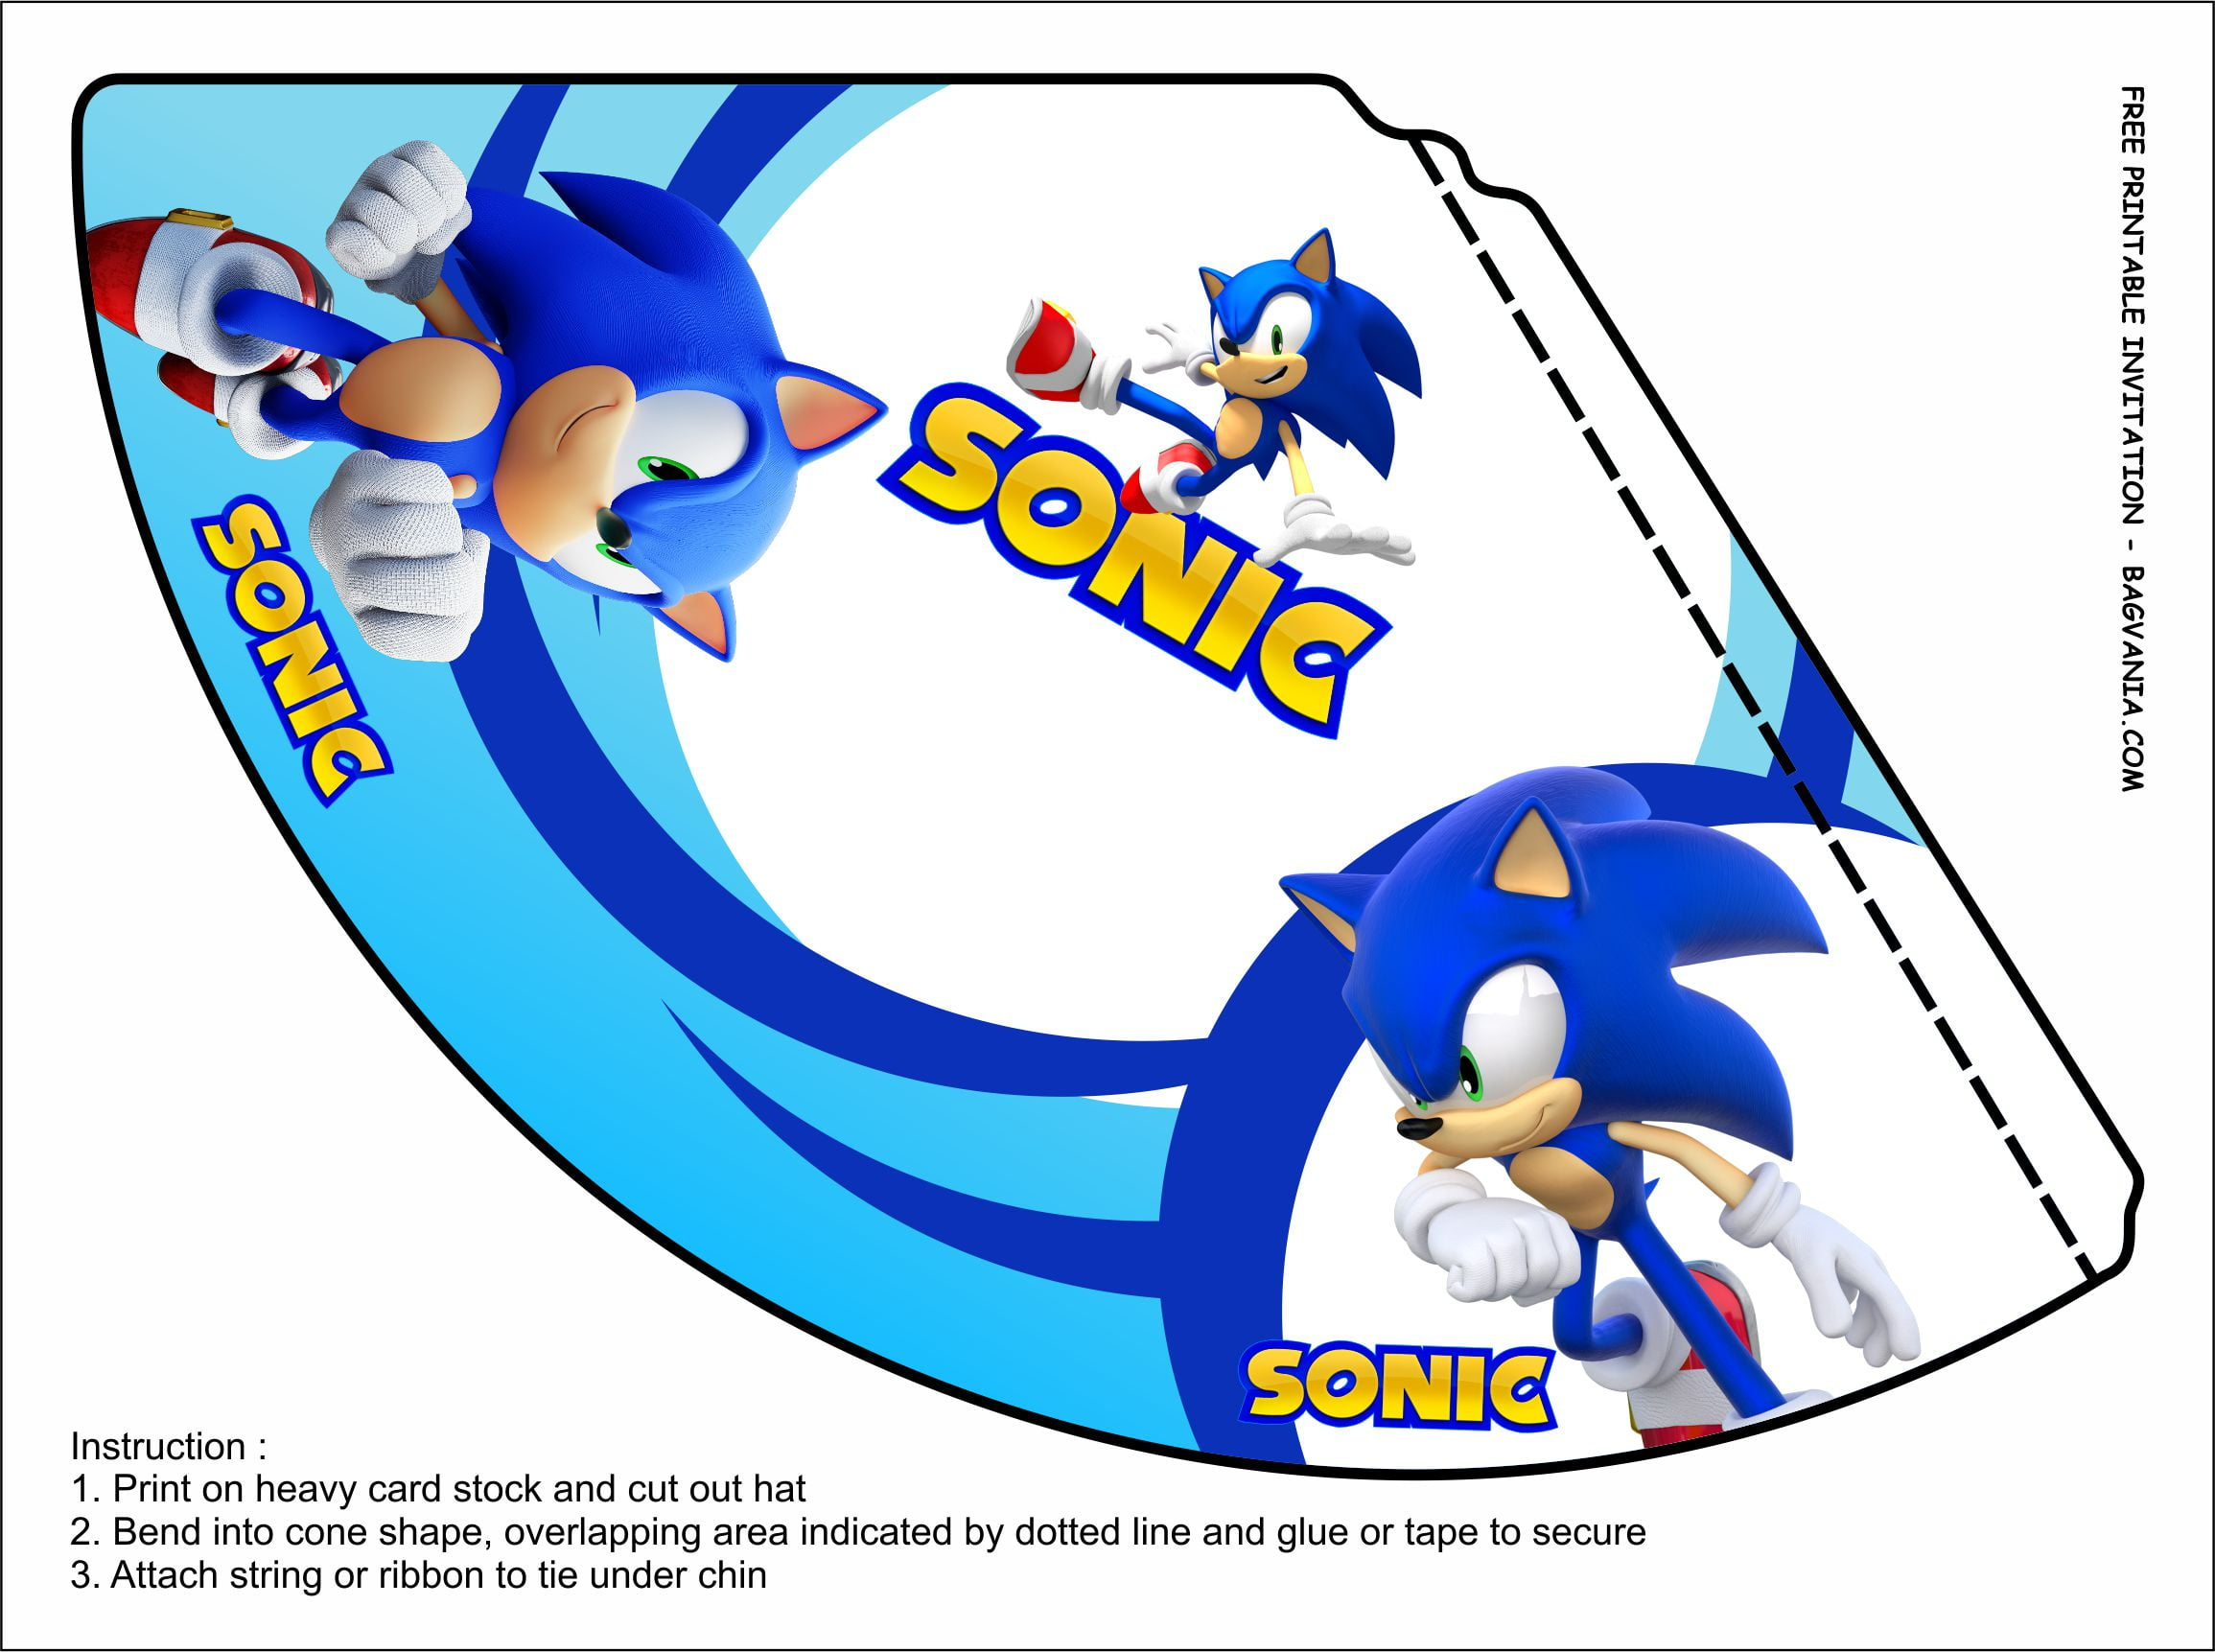 Free Printable Sonic The Hedgehog Birthday Party Kits